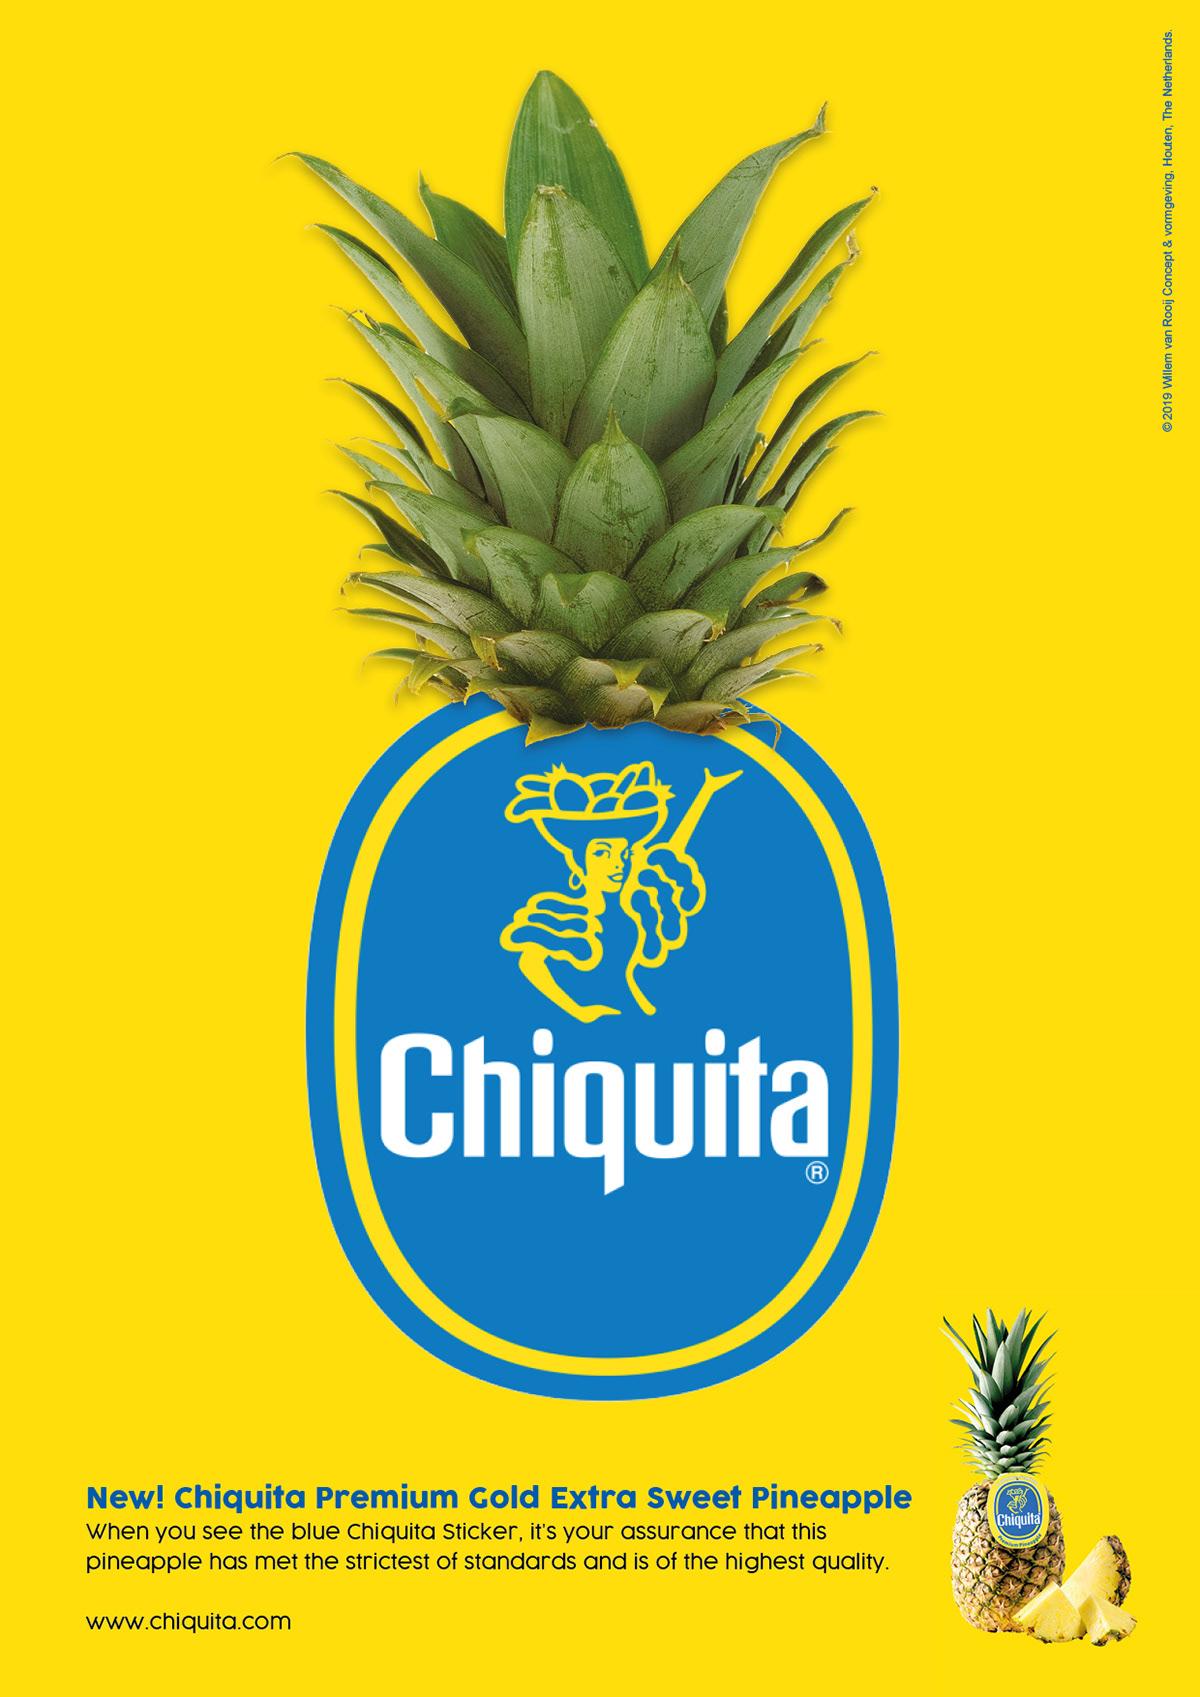 Pineapple chiquita banana Fruit introduction concept